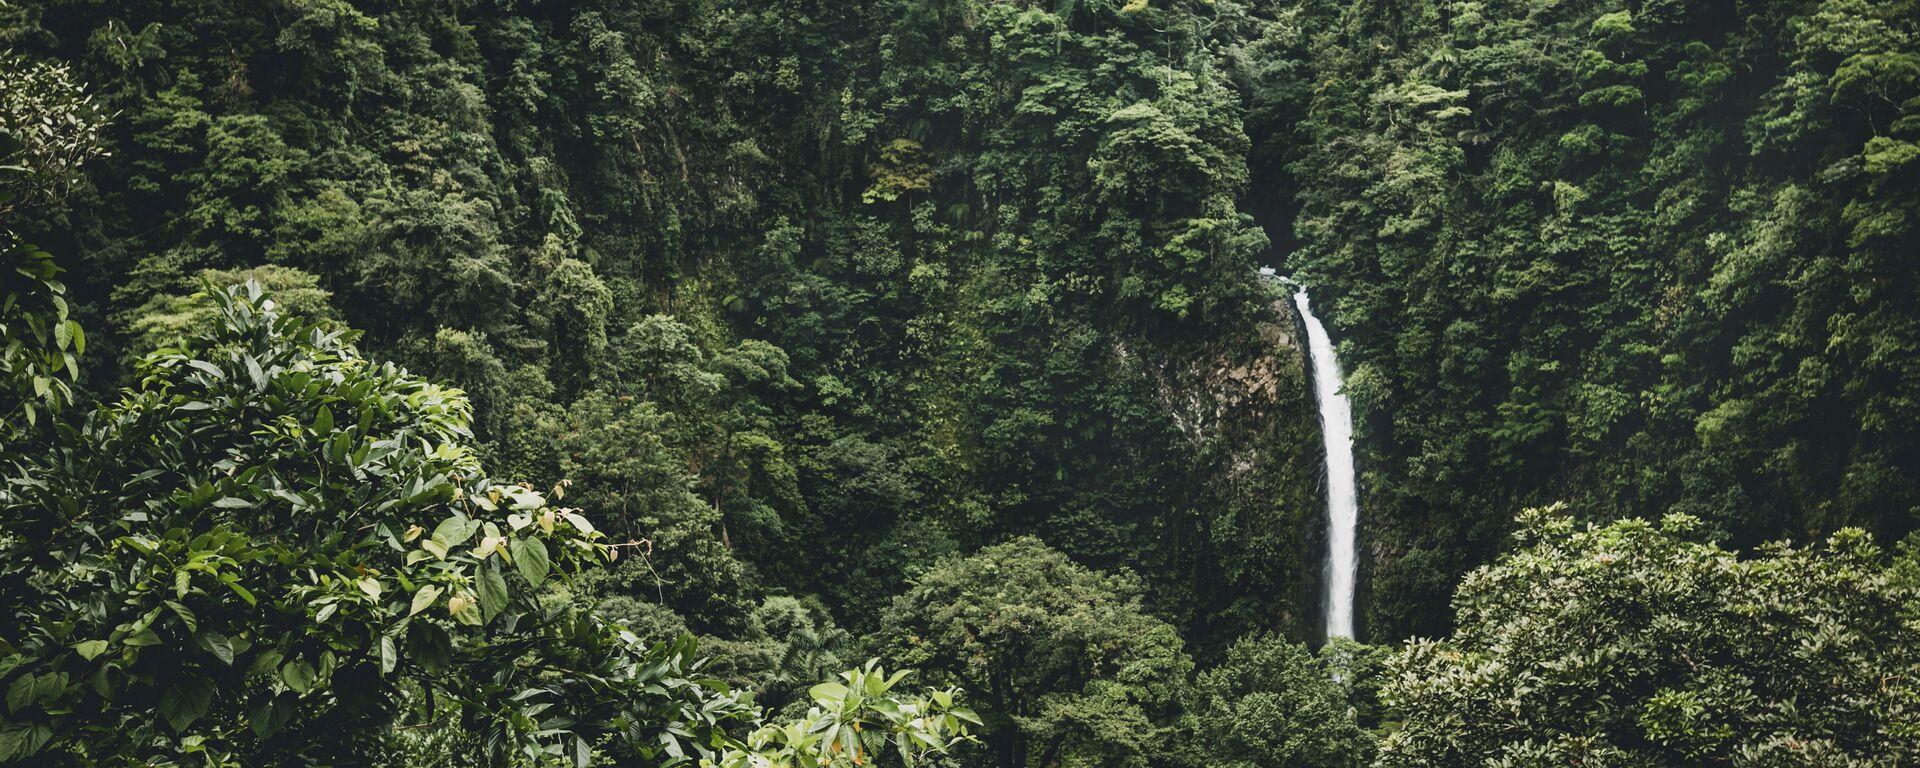 Amazonia (imagen referencial) - Sputnik Mundo, 1920, 03.05.2021